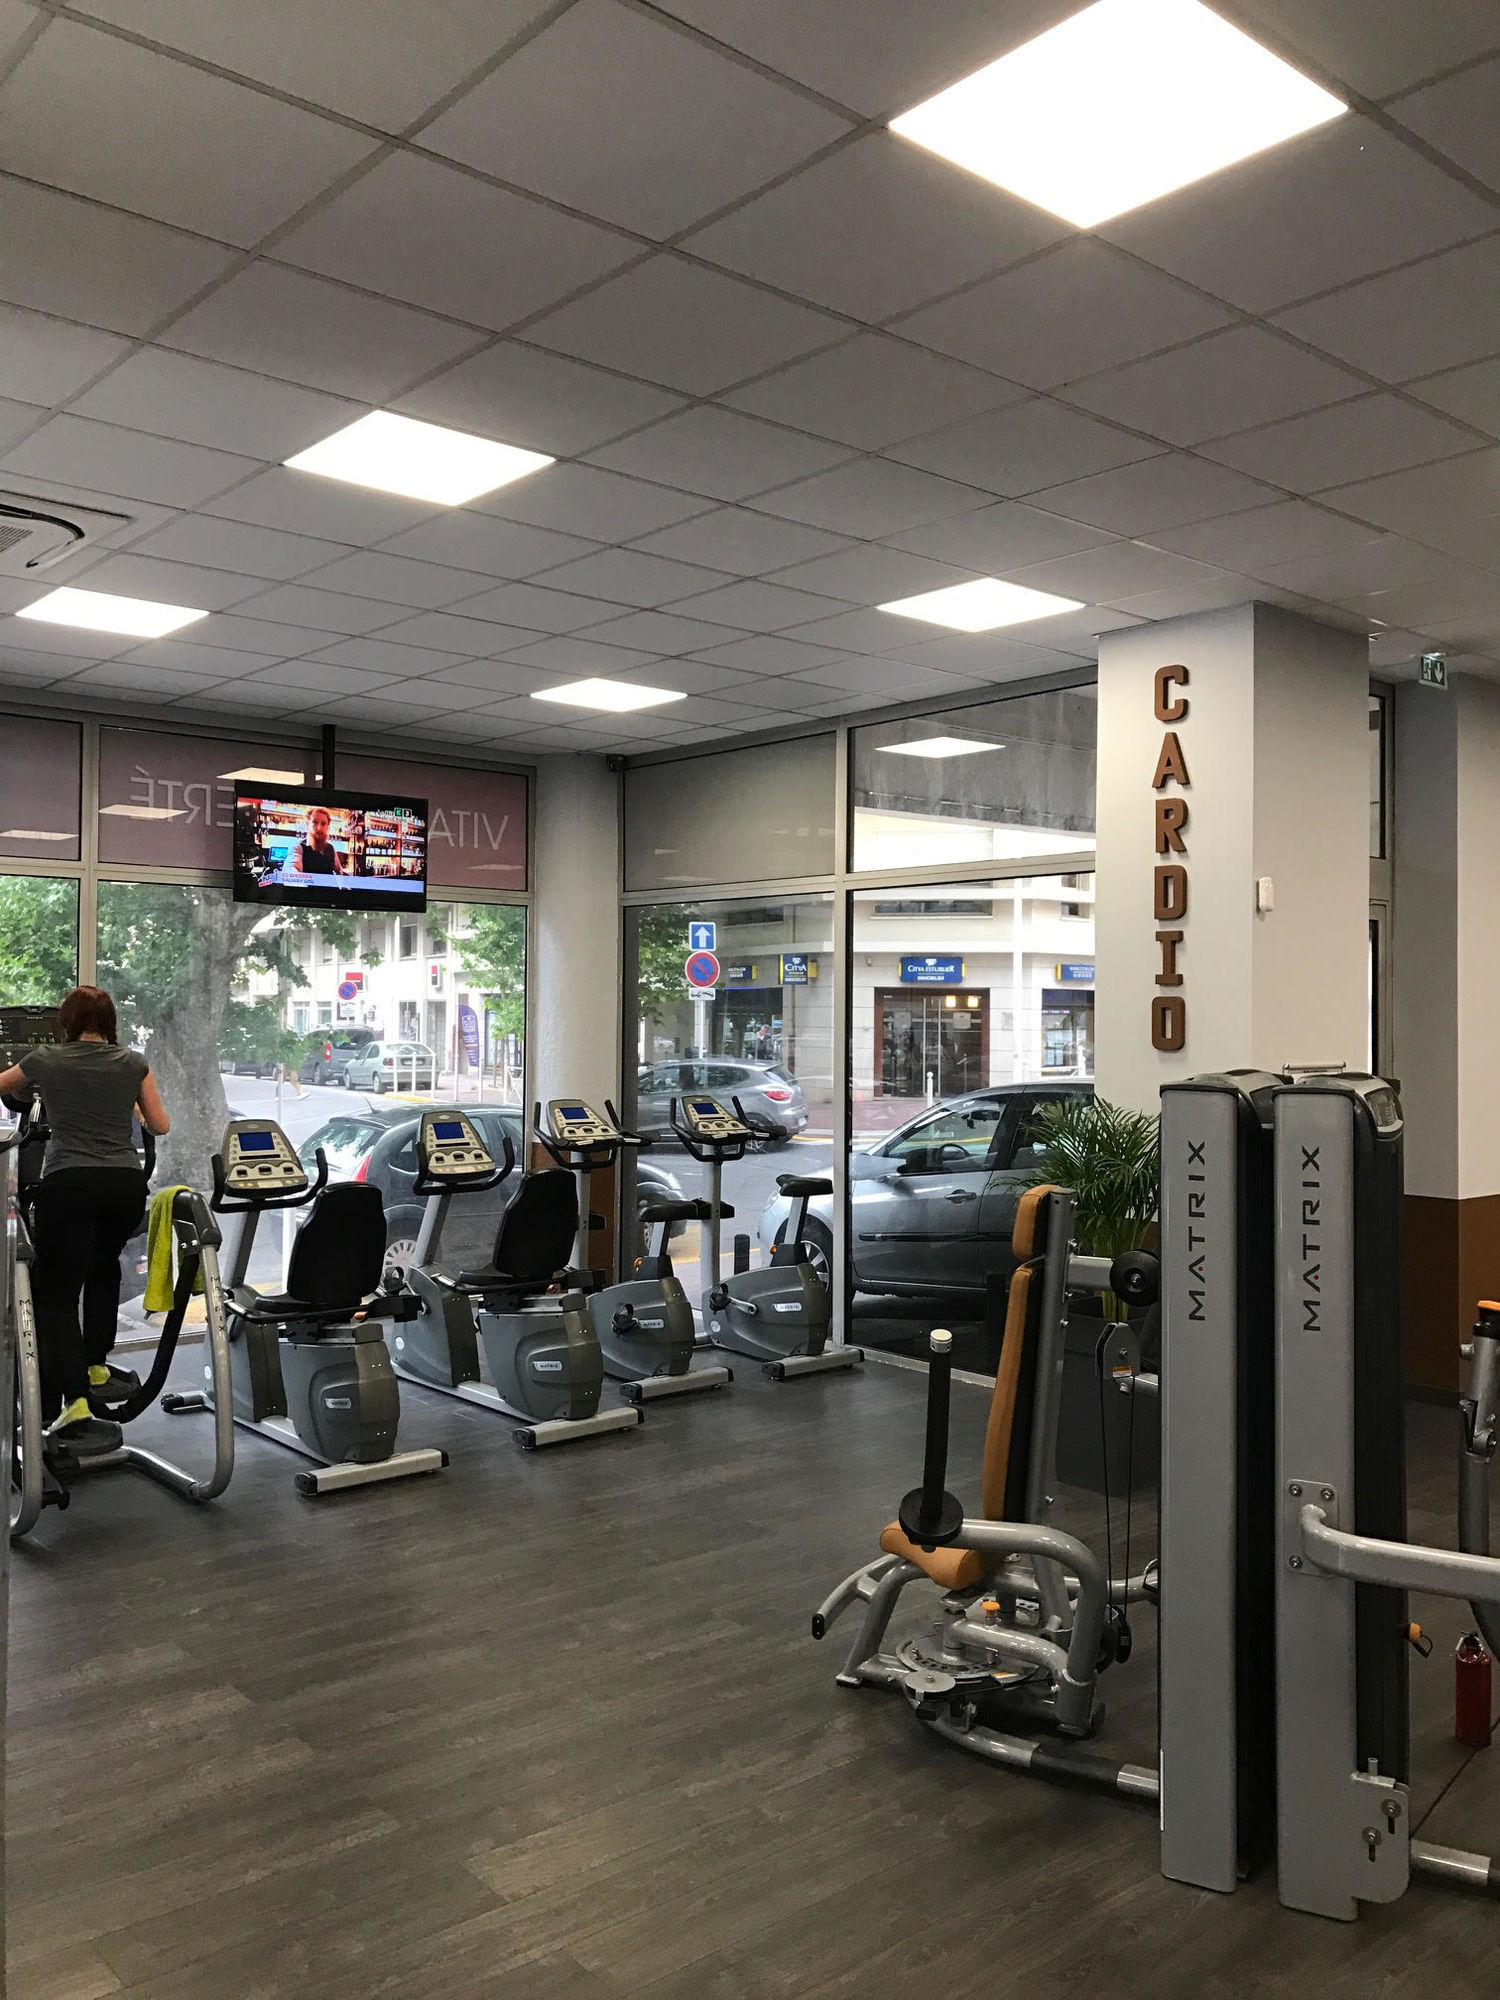 Salle de sport Vita liberté Toulon centre cardio